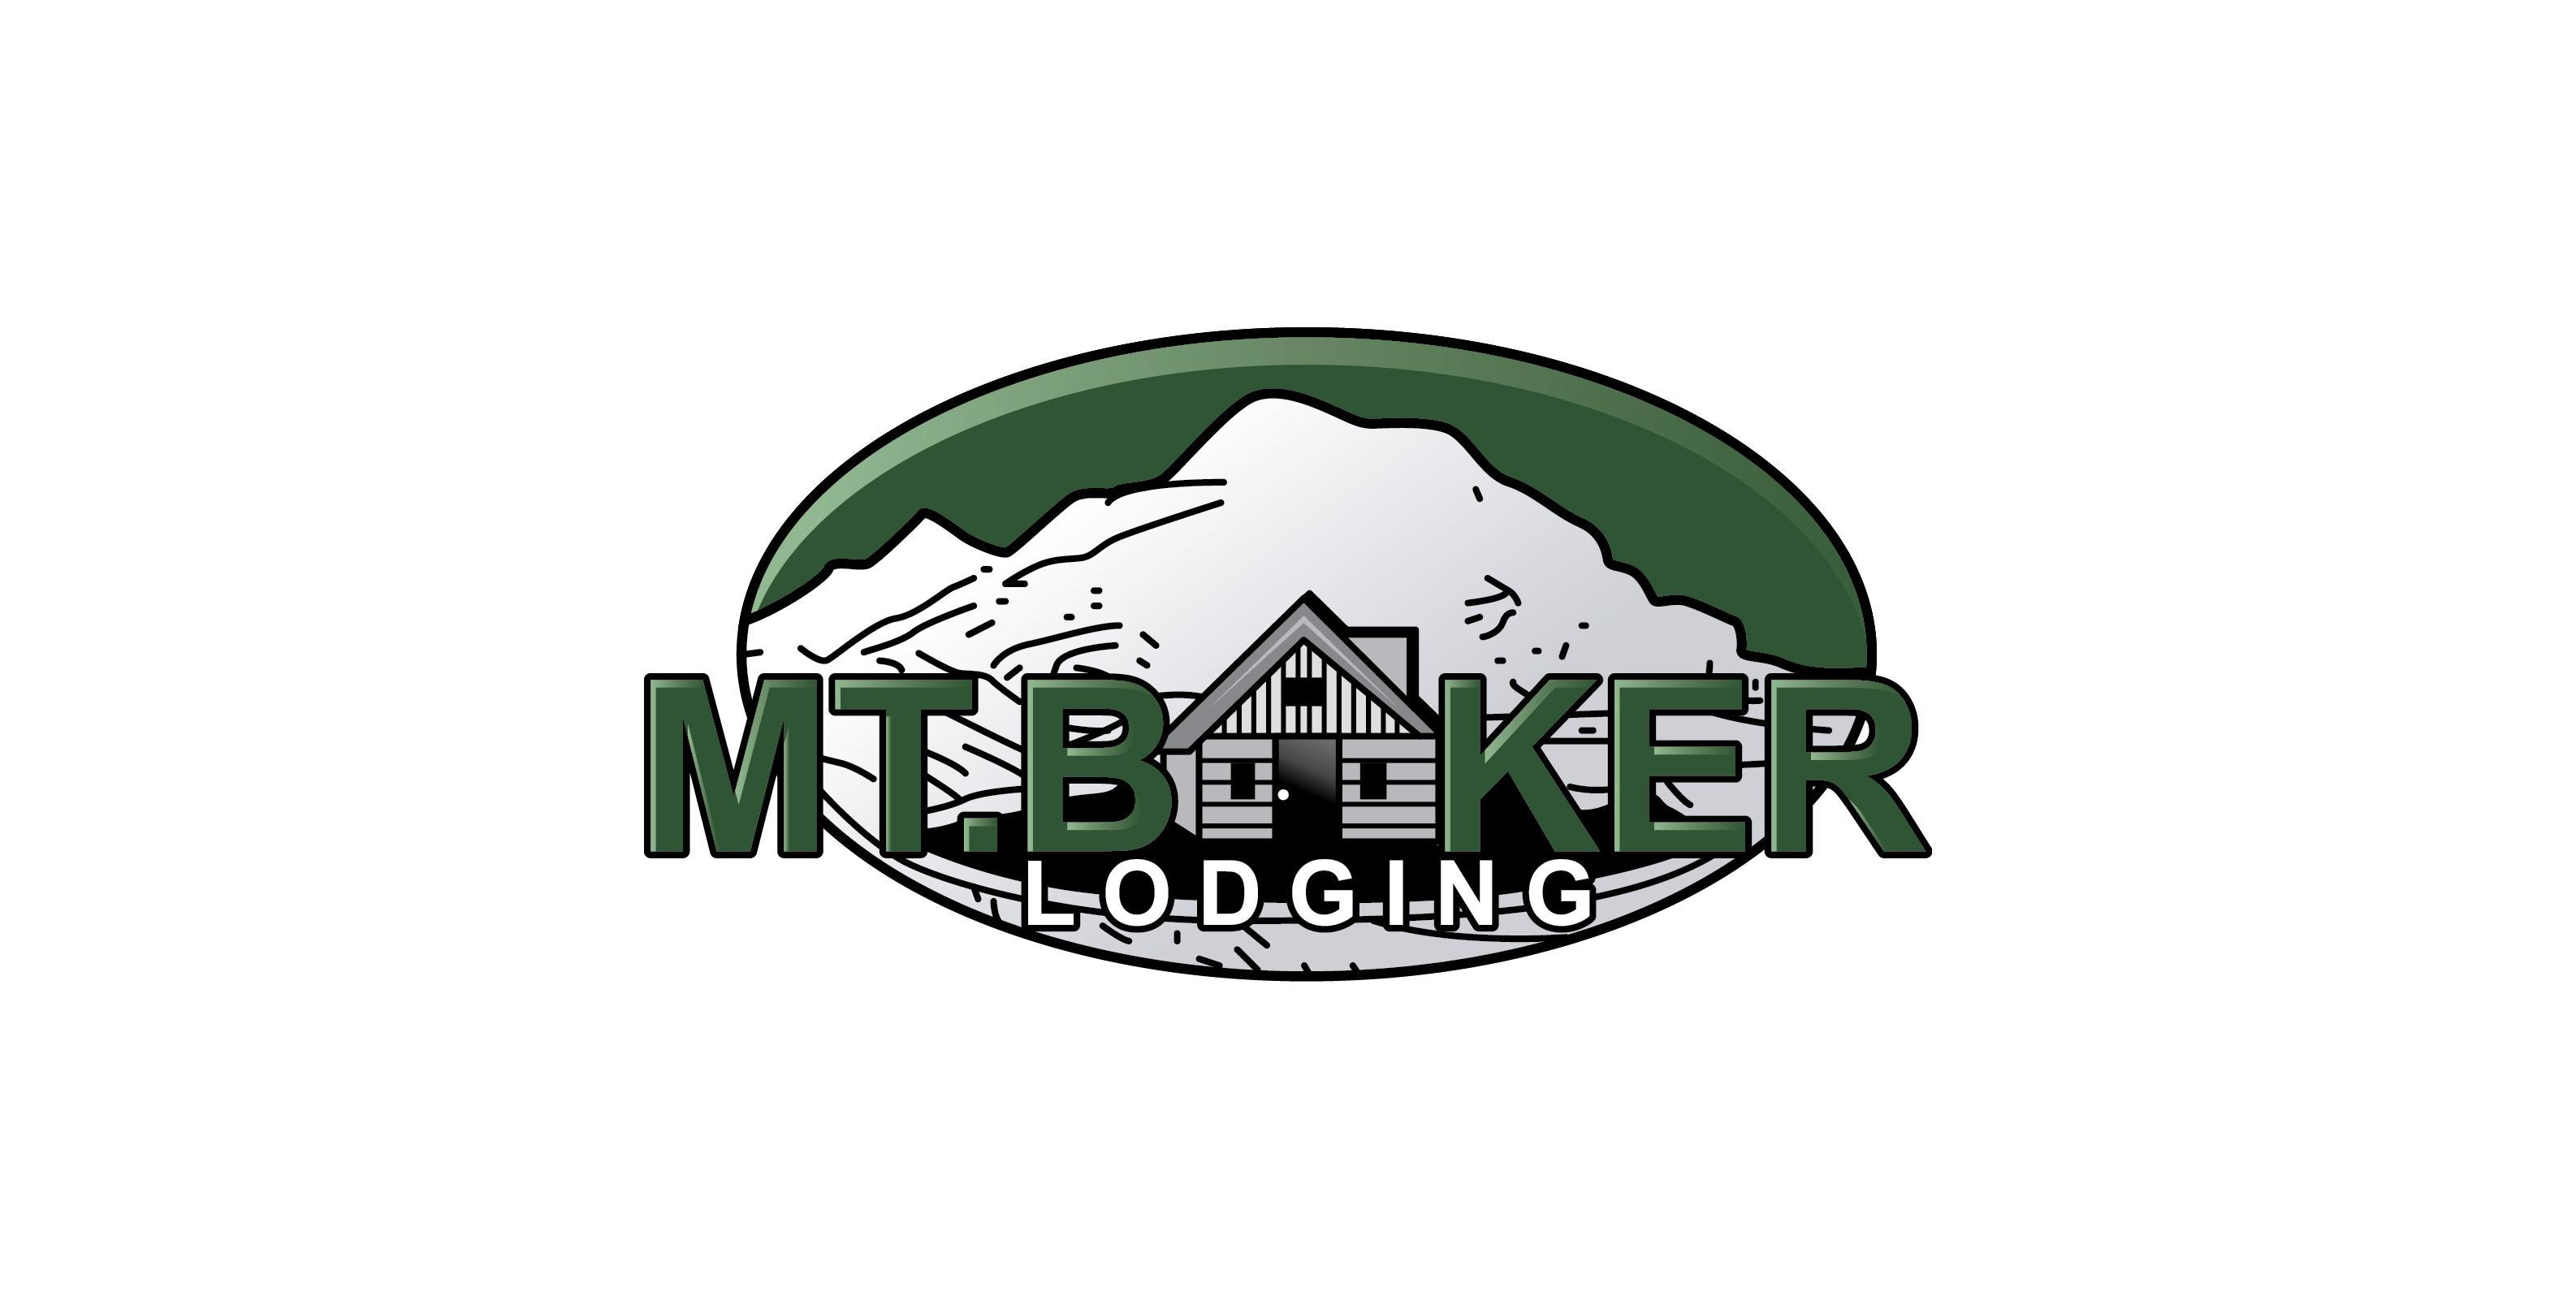 Apartment Mt  Baker Lodging Cabin  55 - HOT TUB  WOOD STOVE  BBQ  SLEEPS 10  photo 31816838